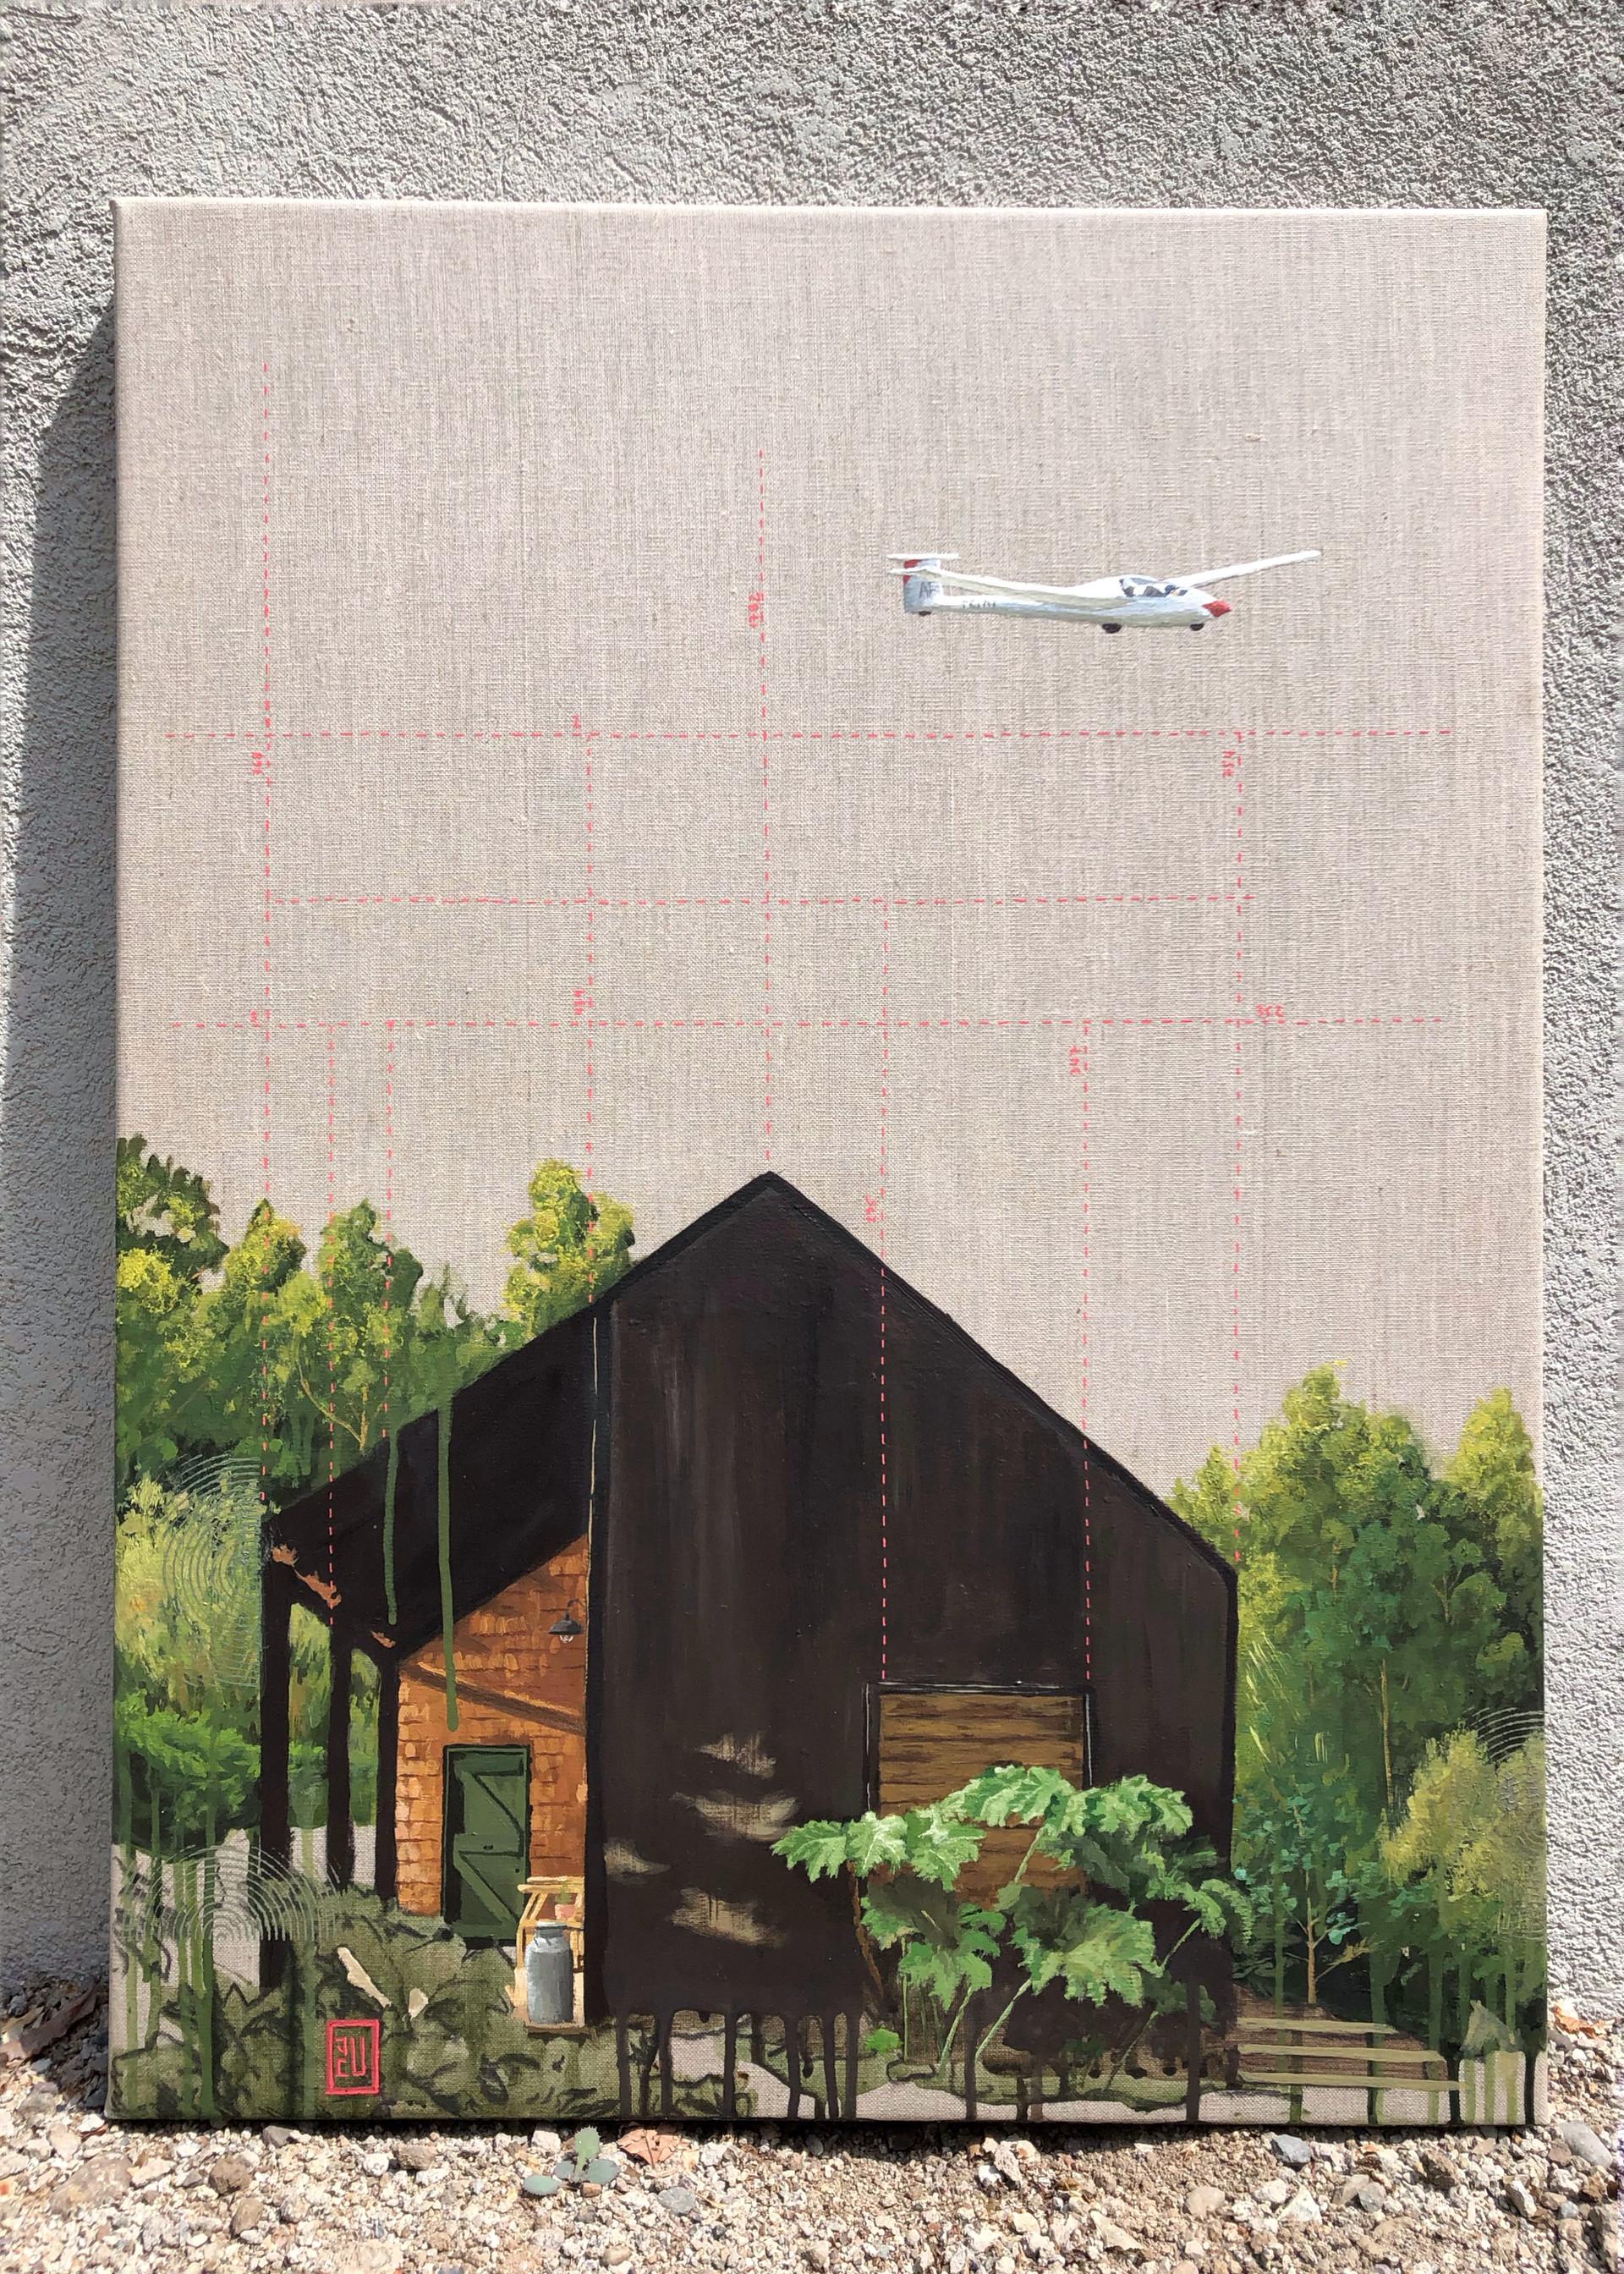 Estudio de vuelo. Acrílico sobre lino. 60 x 80 cm. 2021